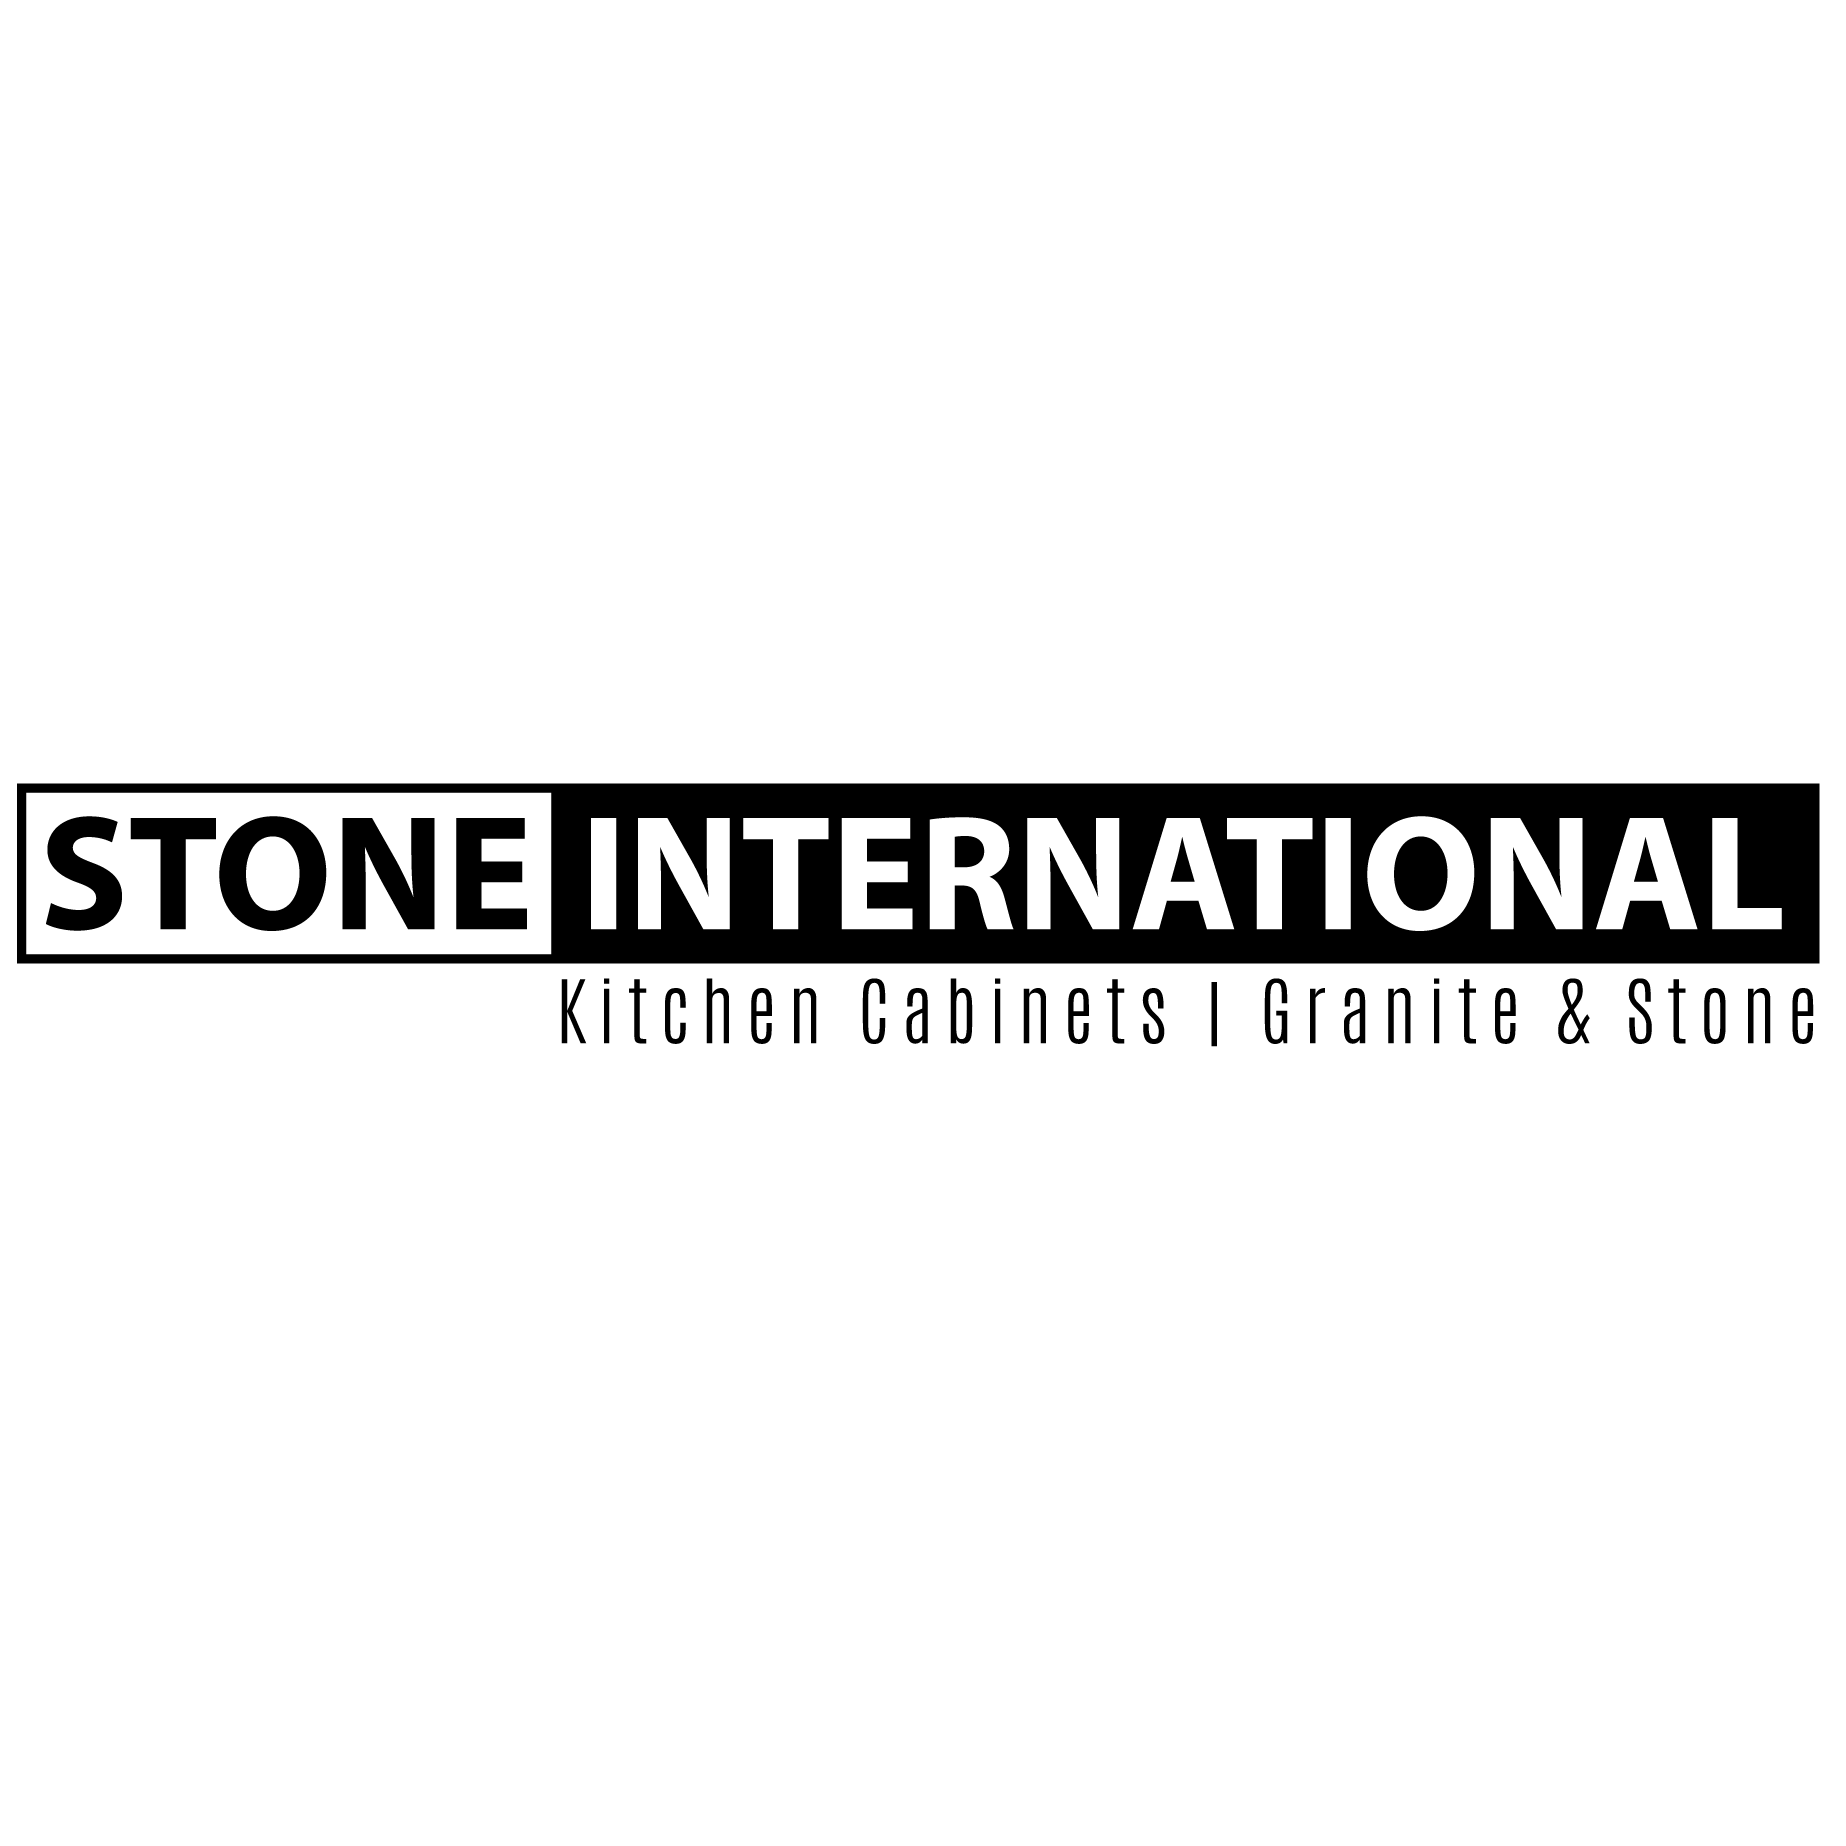 Stone International Cabinets & Stone - Miami, FL 33157 - (786)930-4722 | ShowMeLocal.com